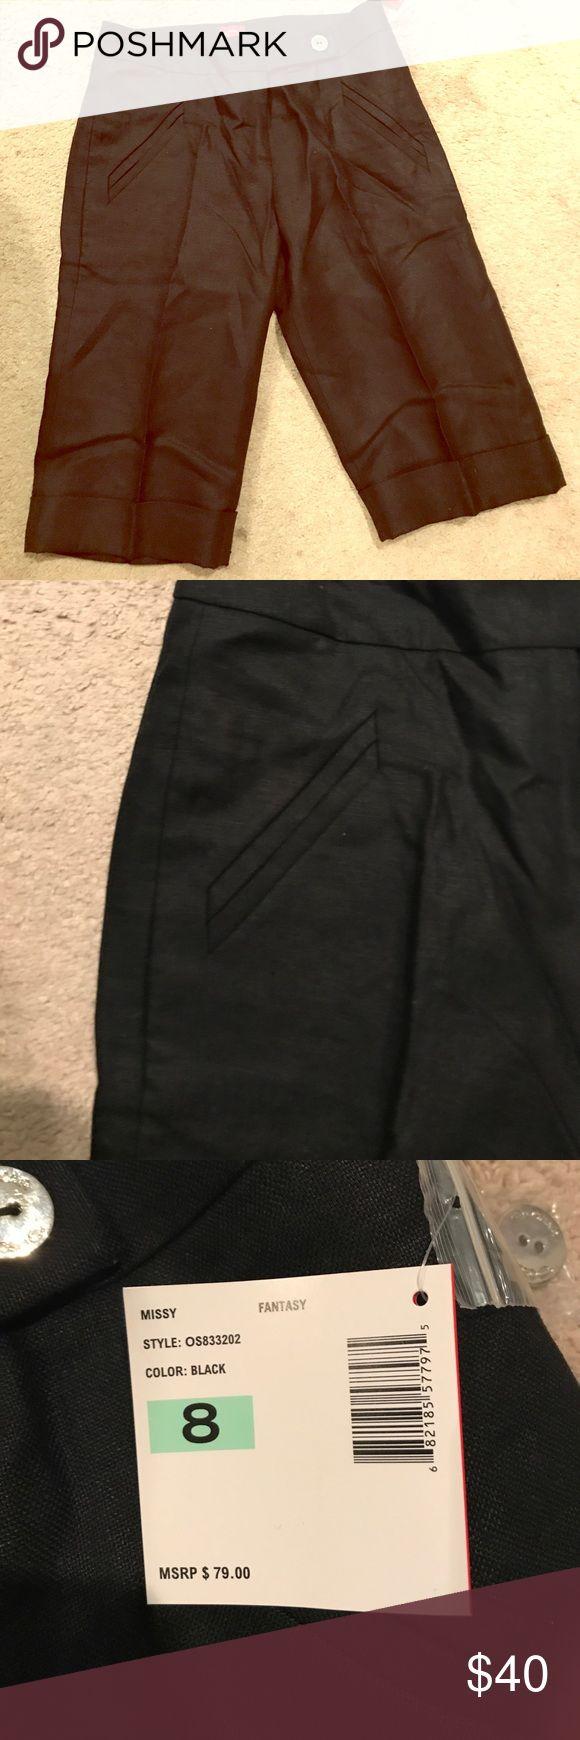 Brand new dressy Oscar linen Bermuda shorts. Brand new black dressy Oscar linen Bermuda shorts with cuffs. Accented by silver medium button for front closure and silver medium button on back button. Size 8. Oscar Shorts Bermudas